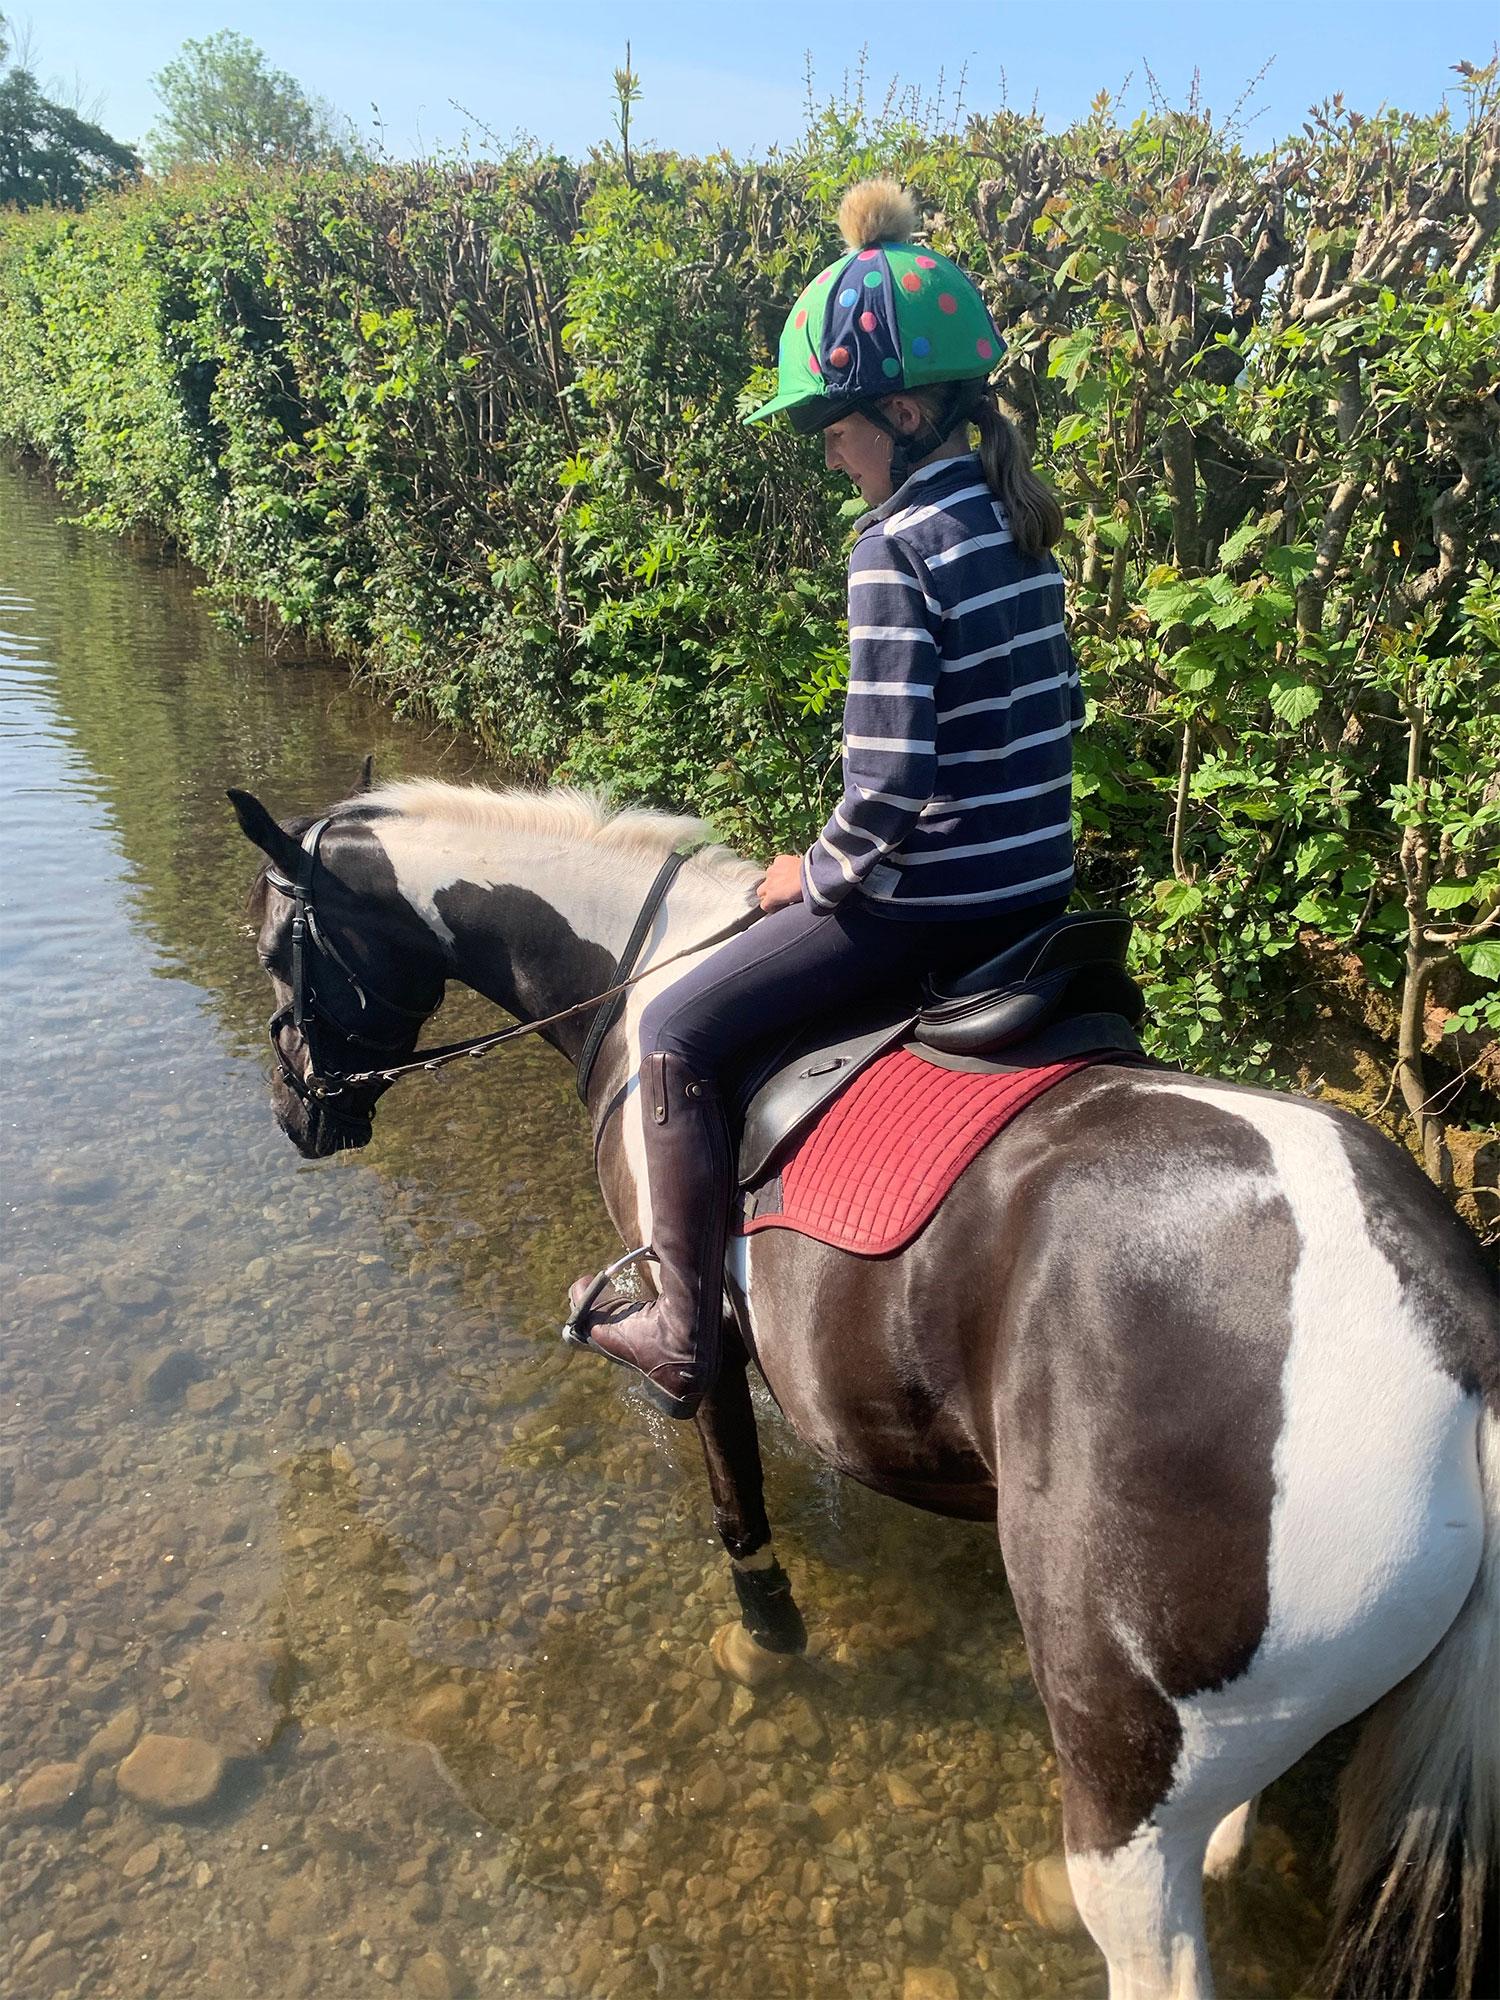 Horse and girl walking through a stream